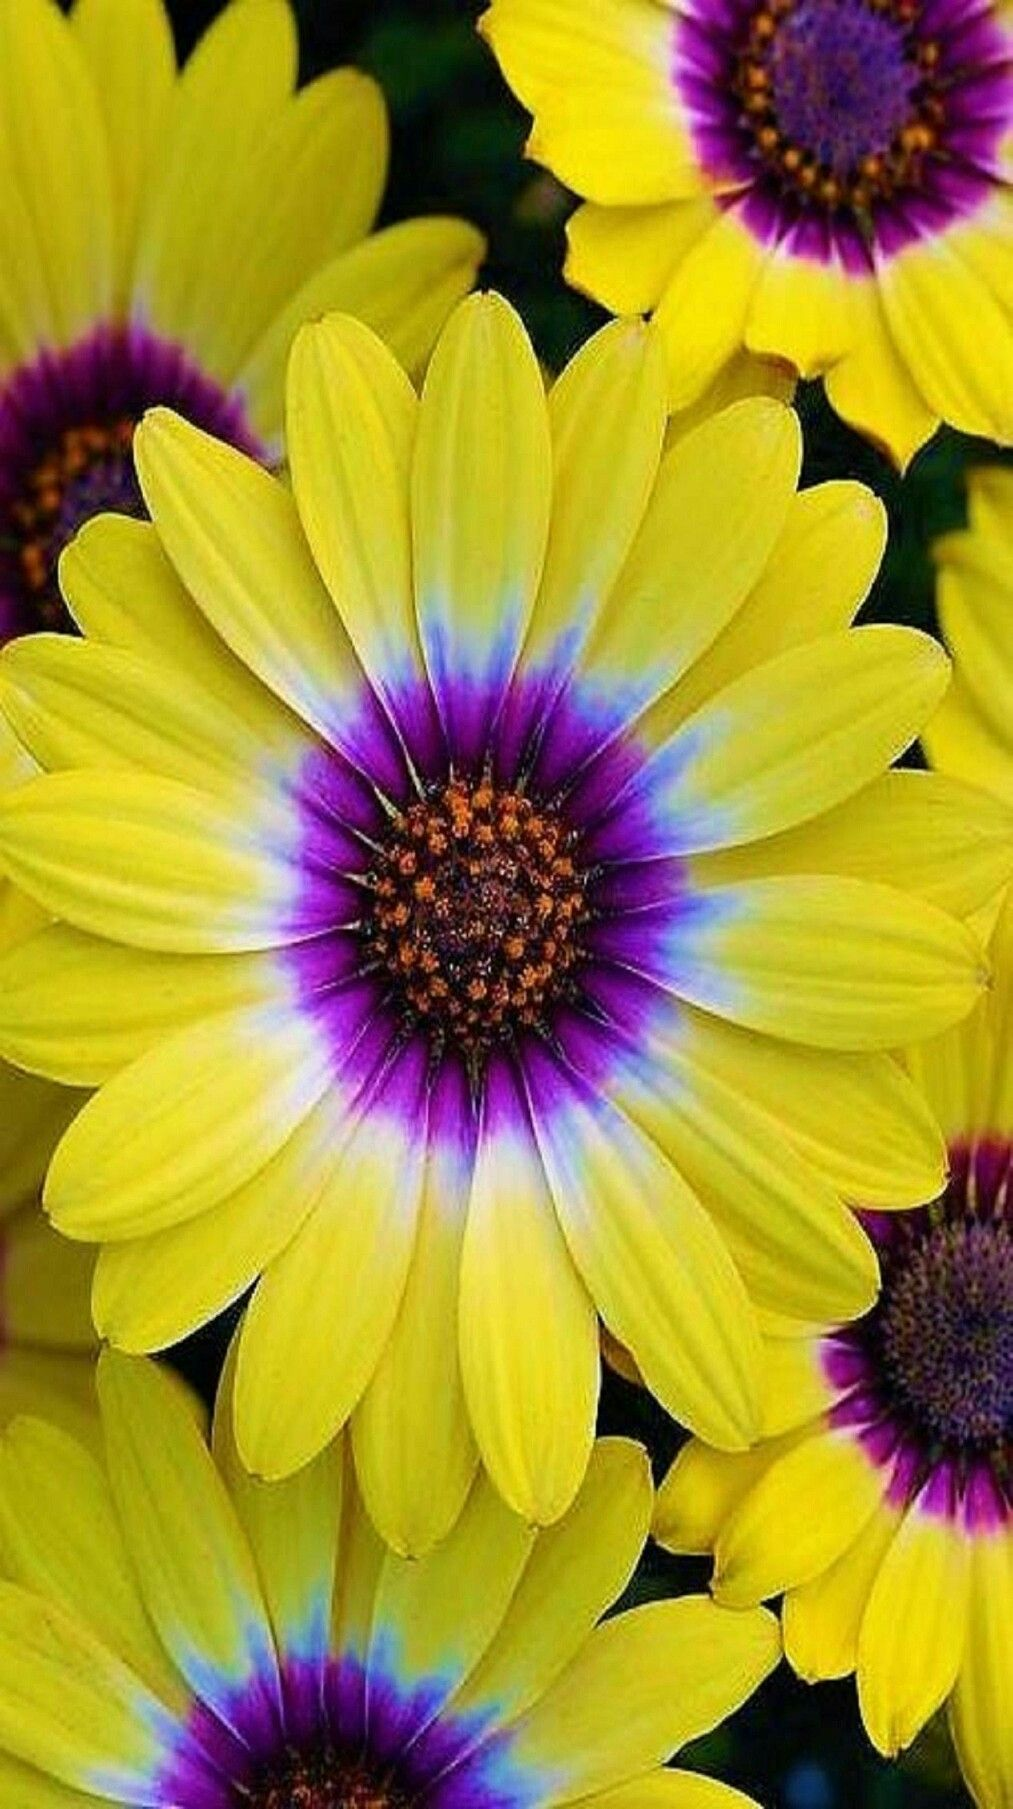 Pin By Frida Bibi On Hermosas Flores Beautiful Flowers Pinterest